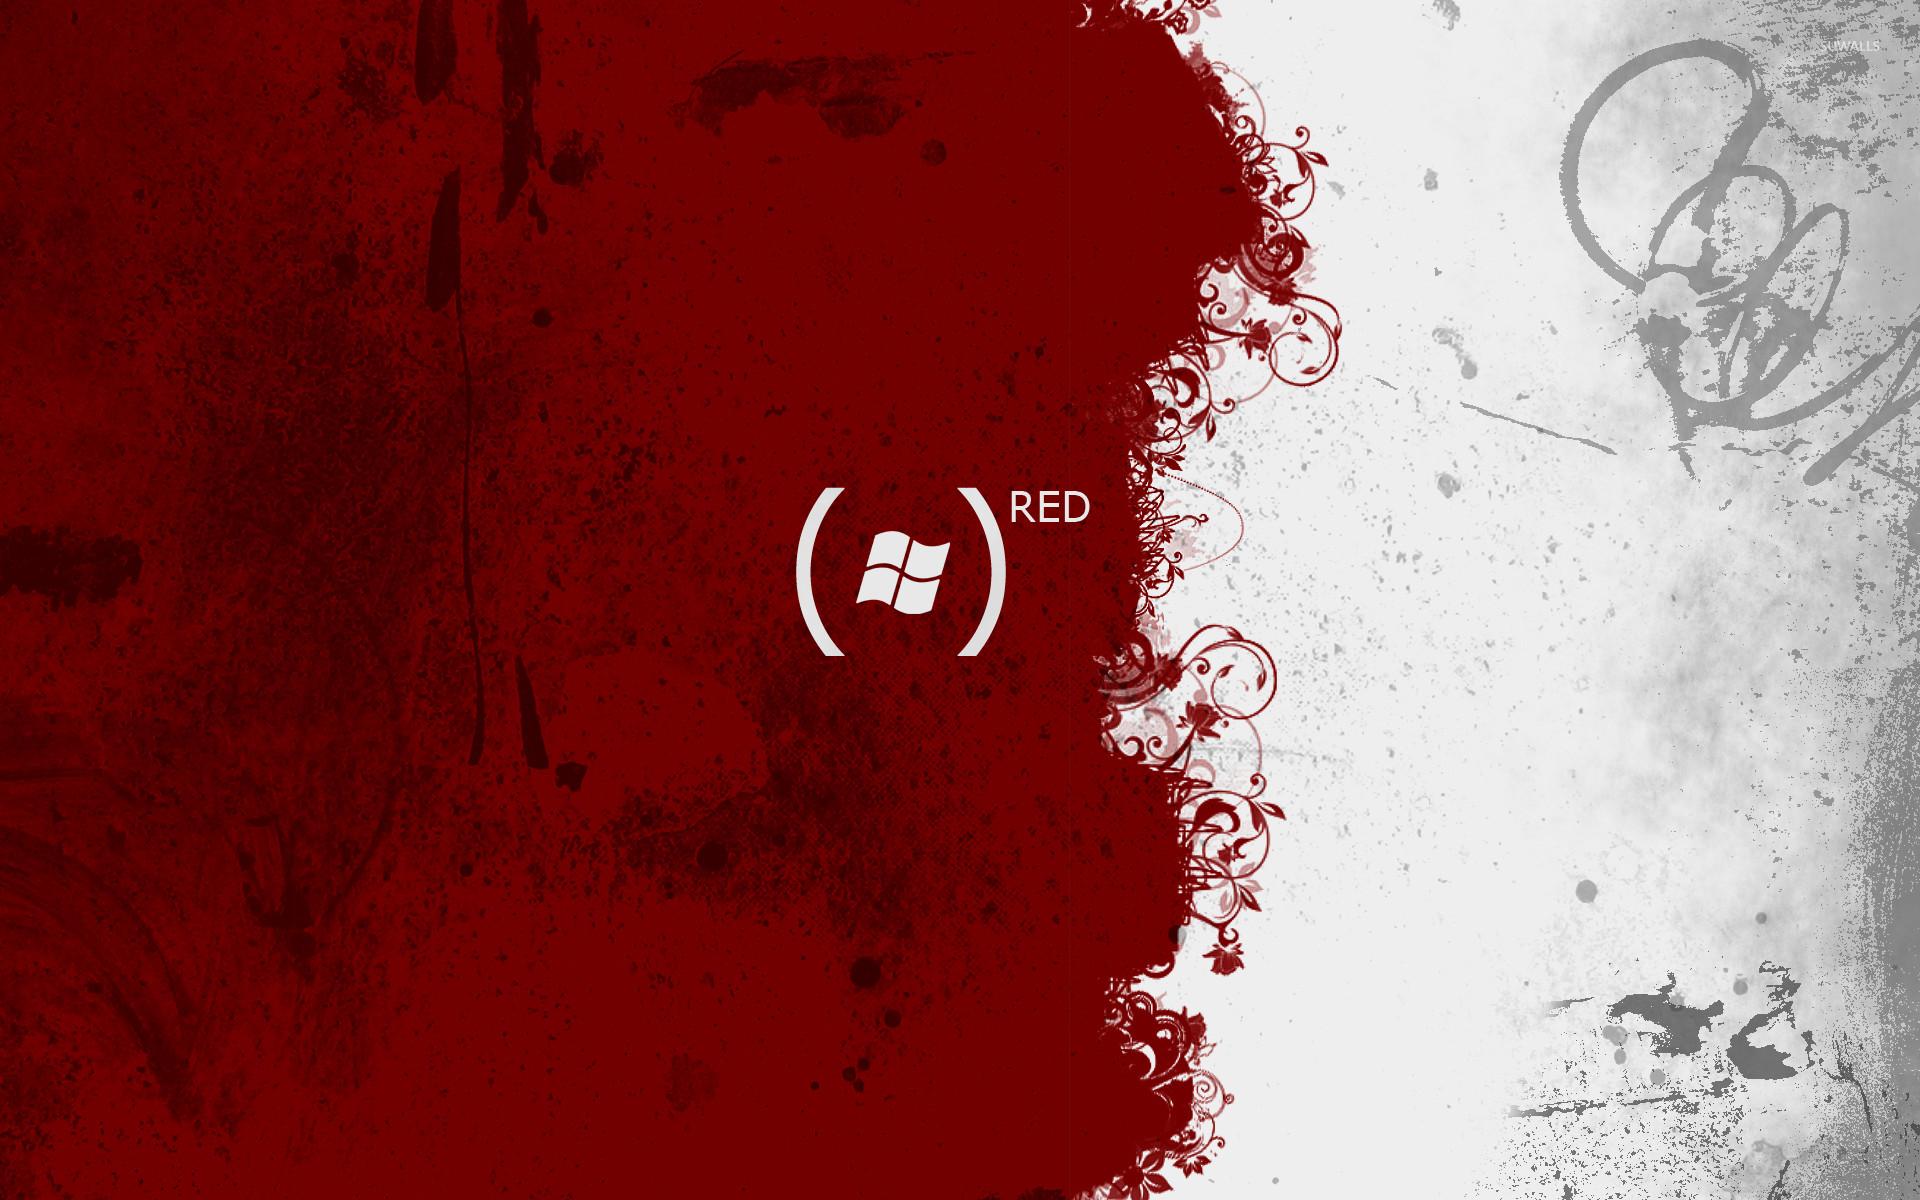 Windows Red Wallpaper